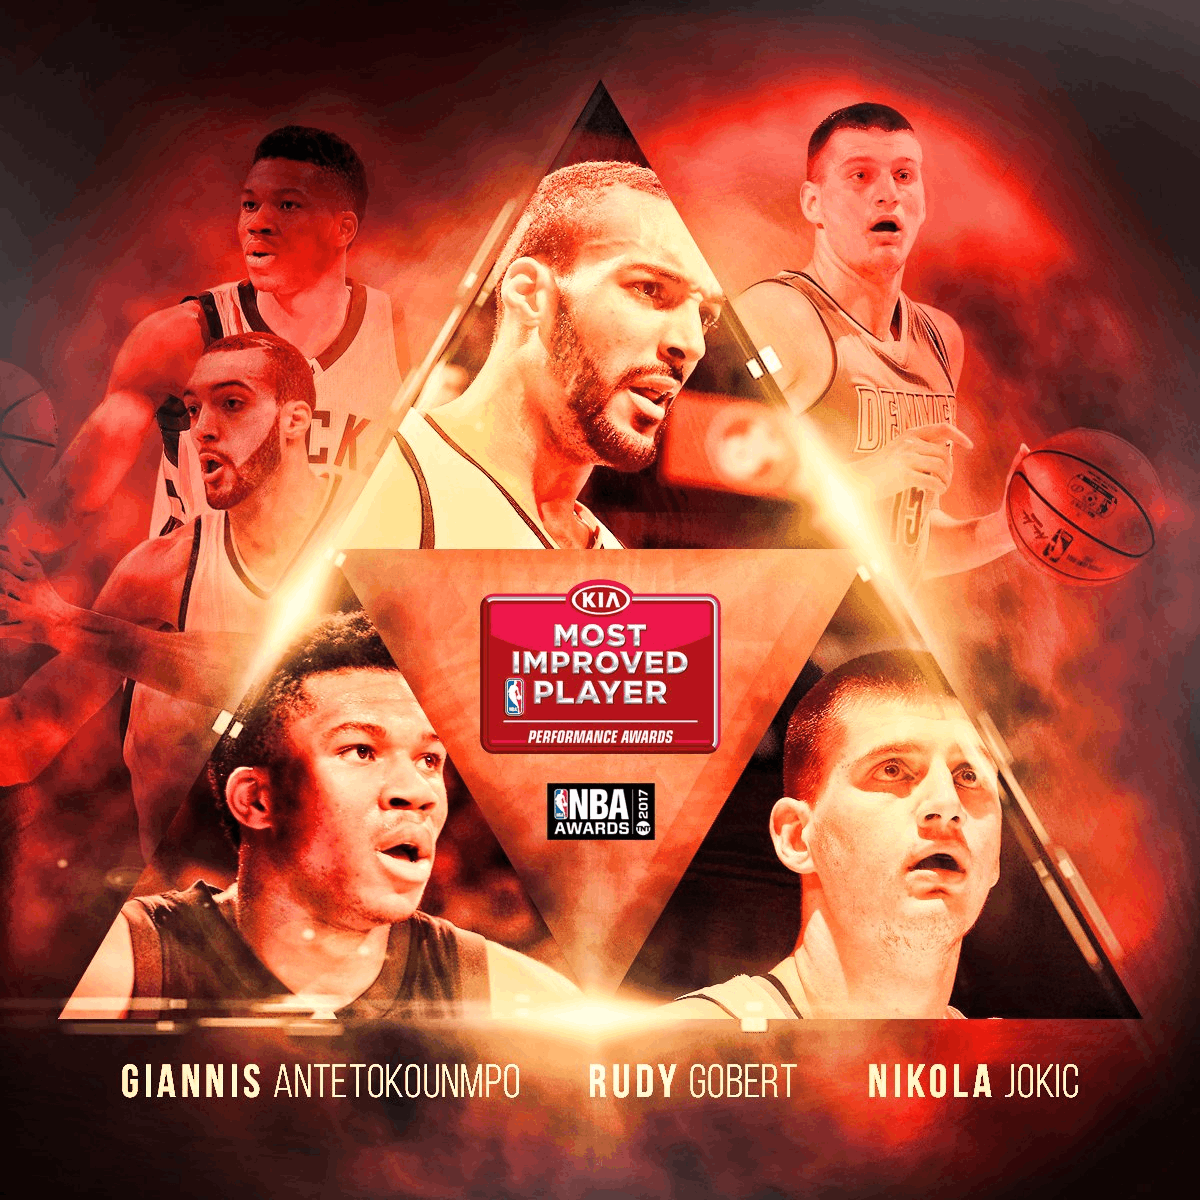 NBA公佈各獎項最終候選 火箭雙槍競爭最佳第6人